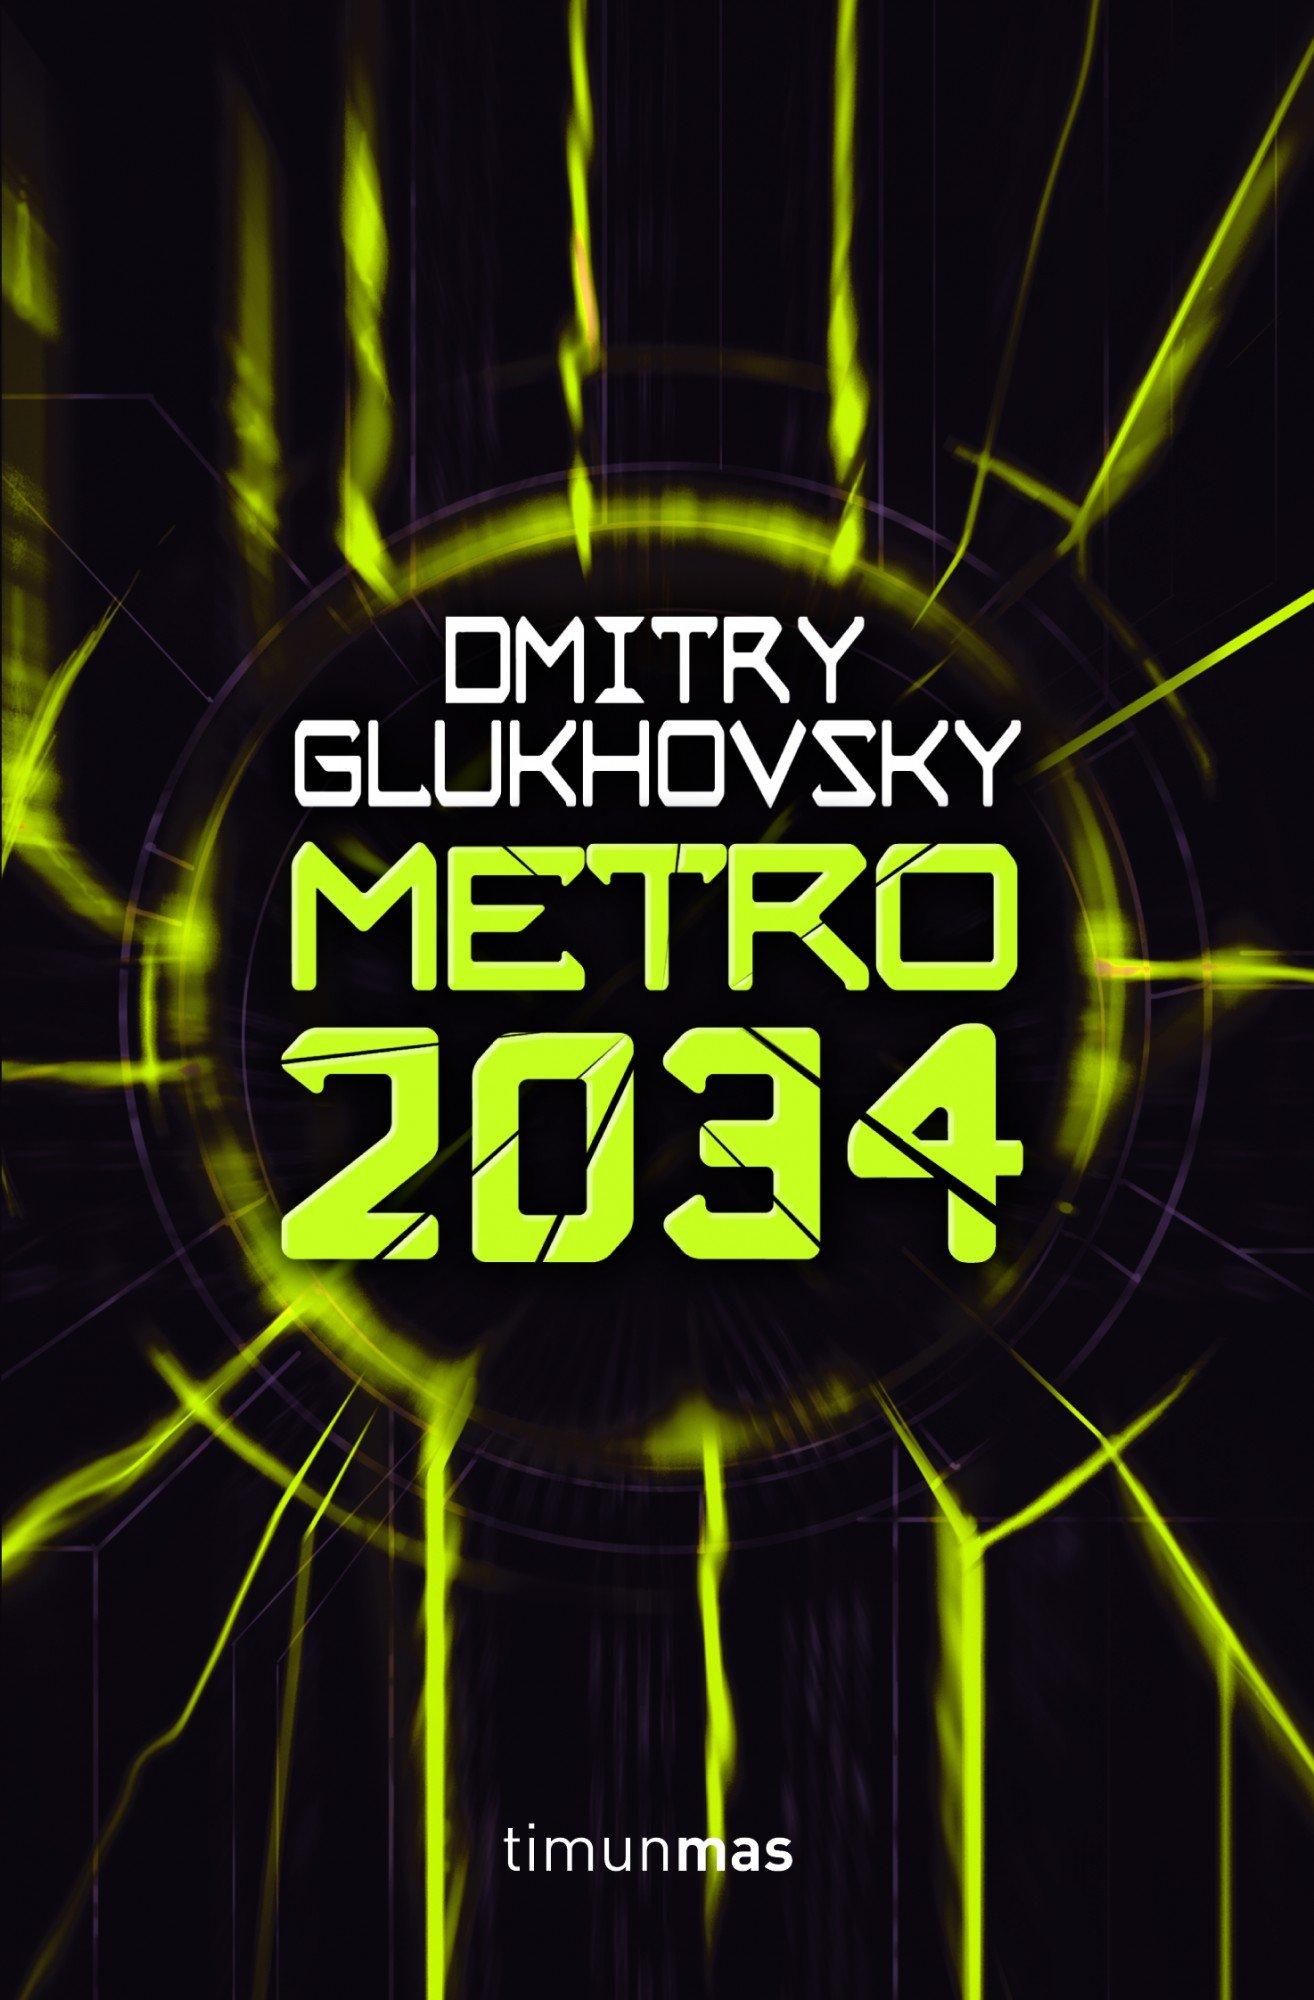 Metro 2034 (Universo Metro) Tapa blanda – 5 mar 2013 Dmitry Glukhovsky Joan Josep Mussarra Roca Timun Mas Narrativa 8448008413